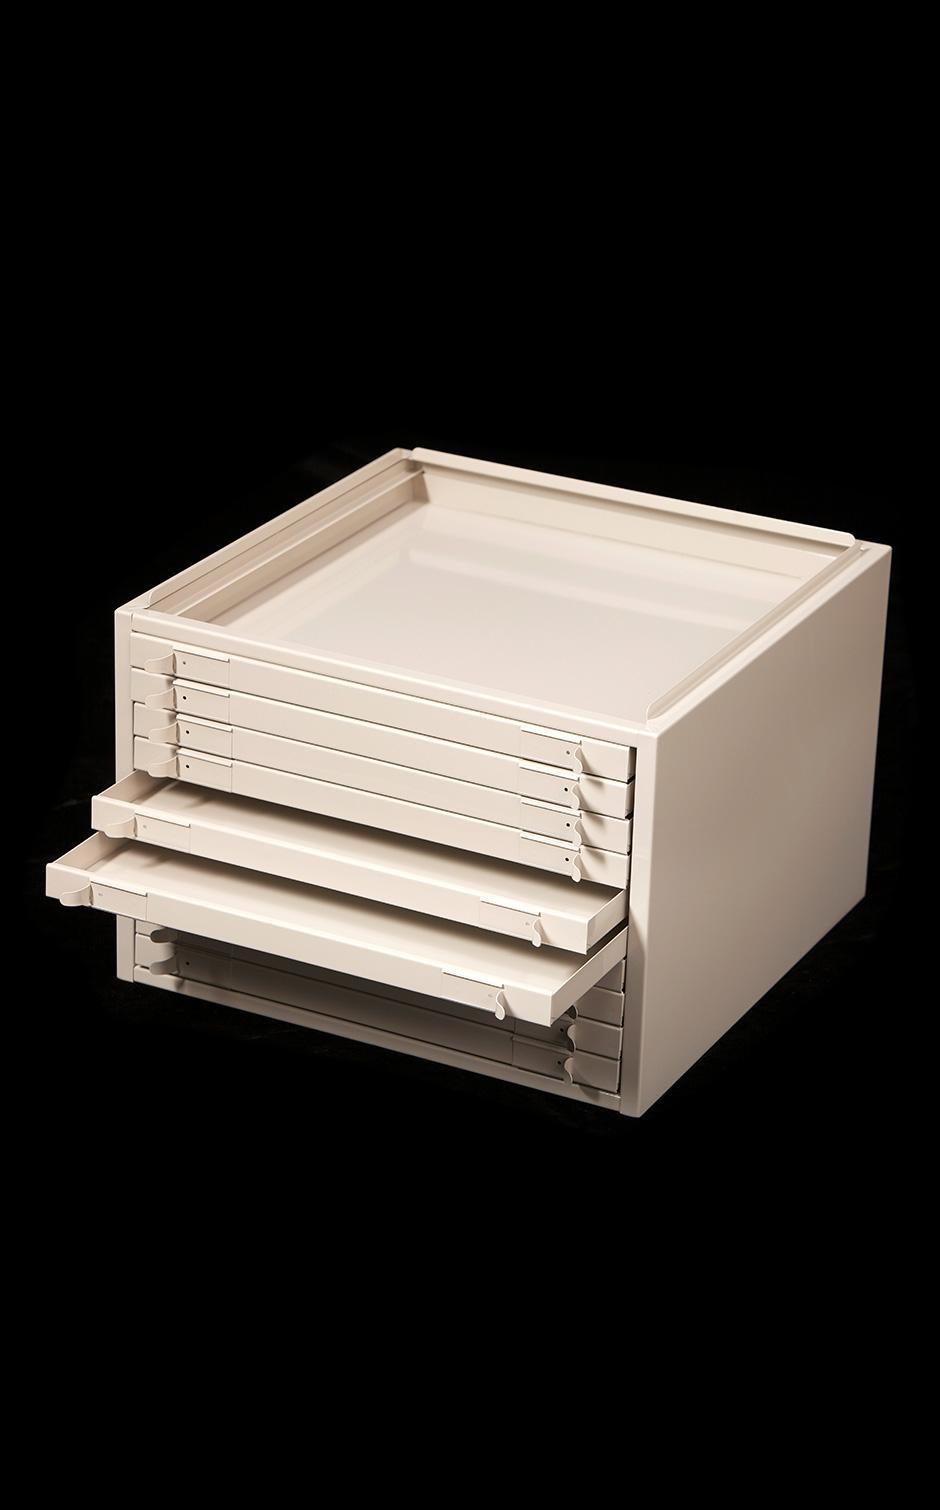 IDT-racks-and-panels-manufacturer